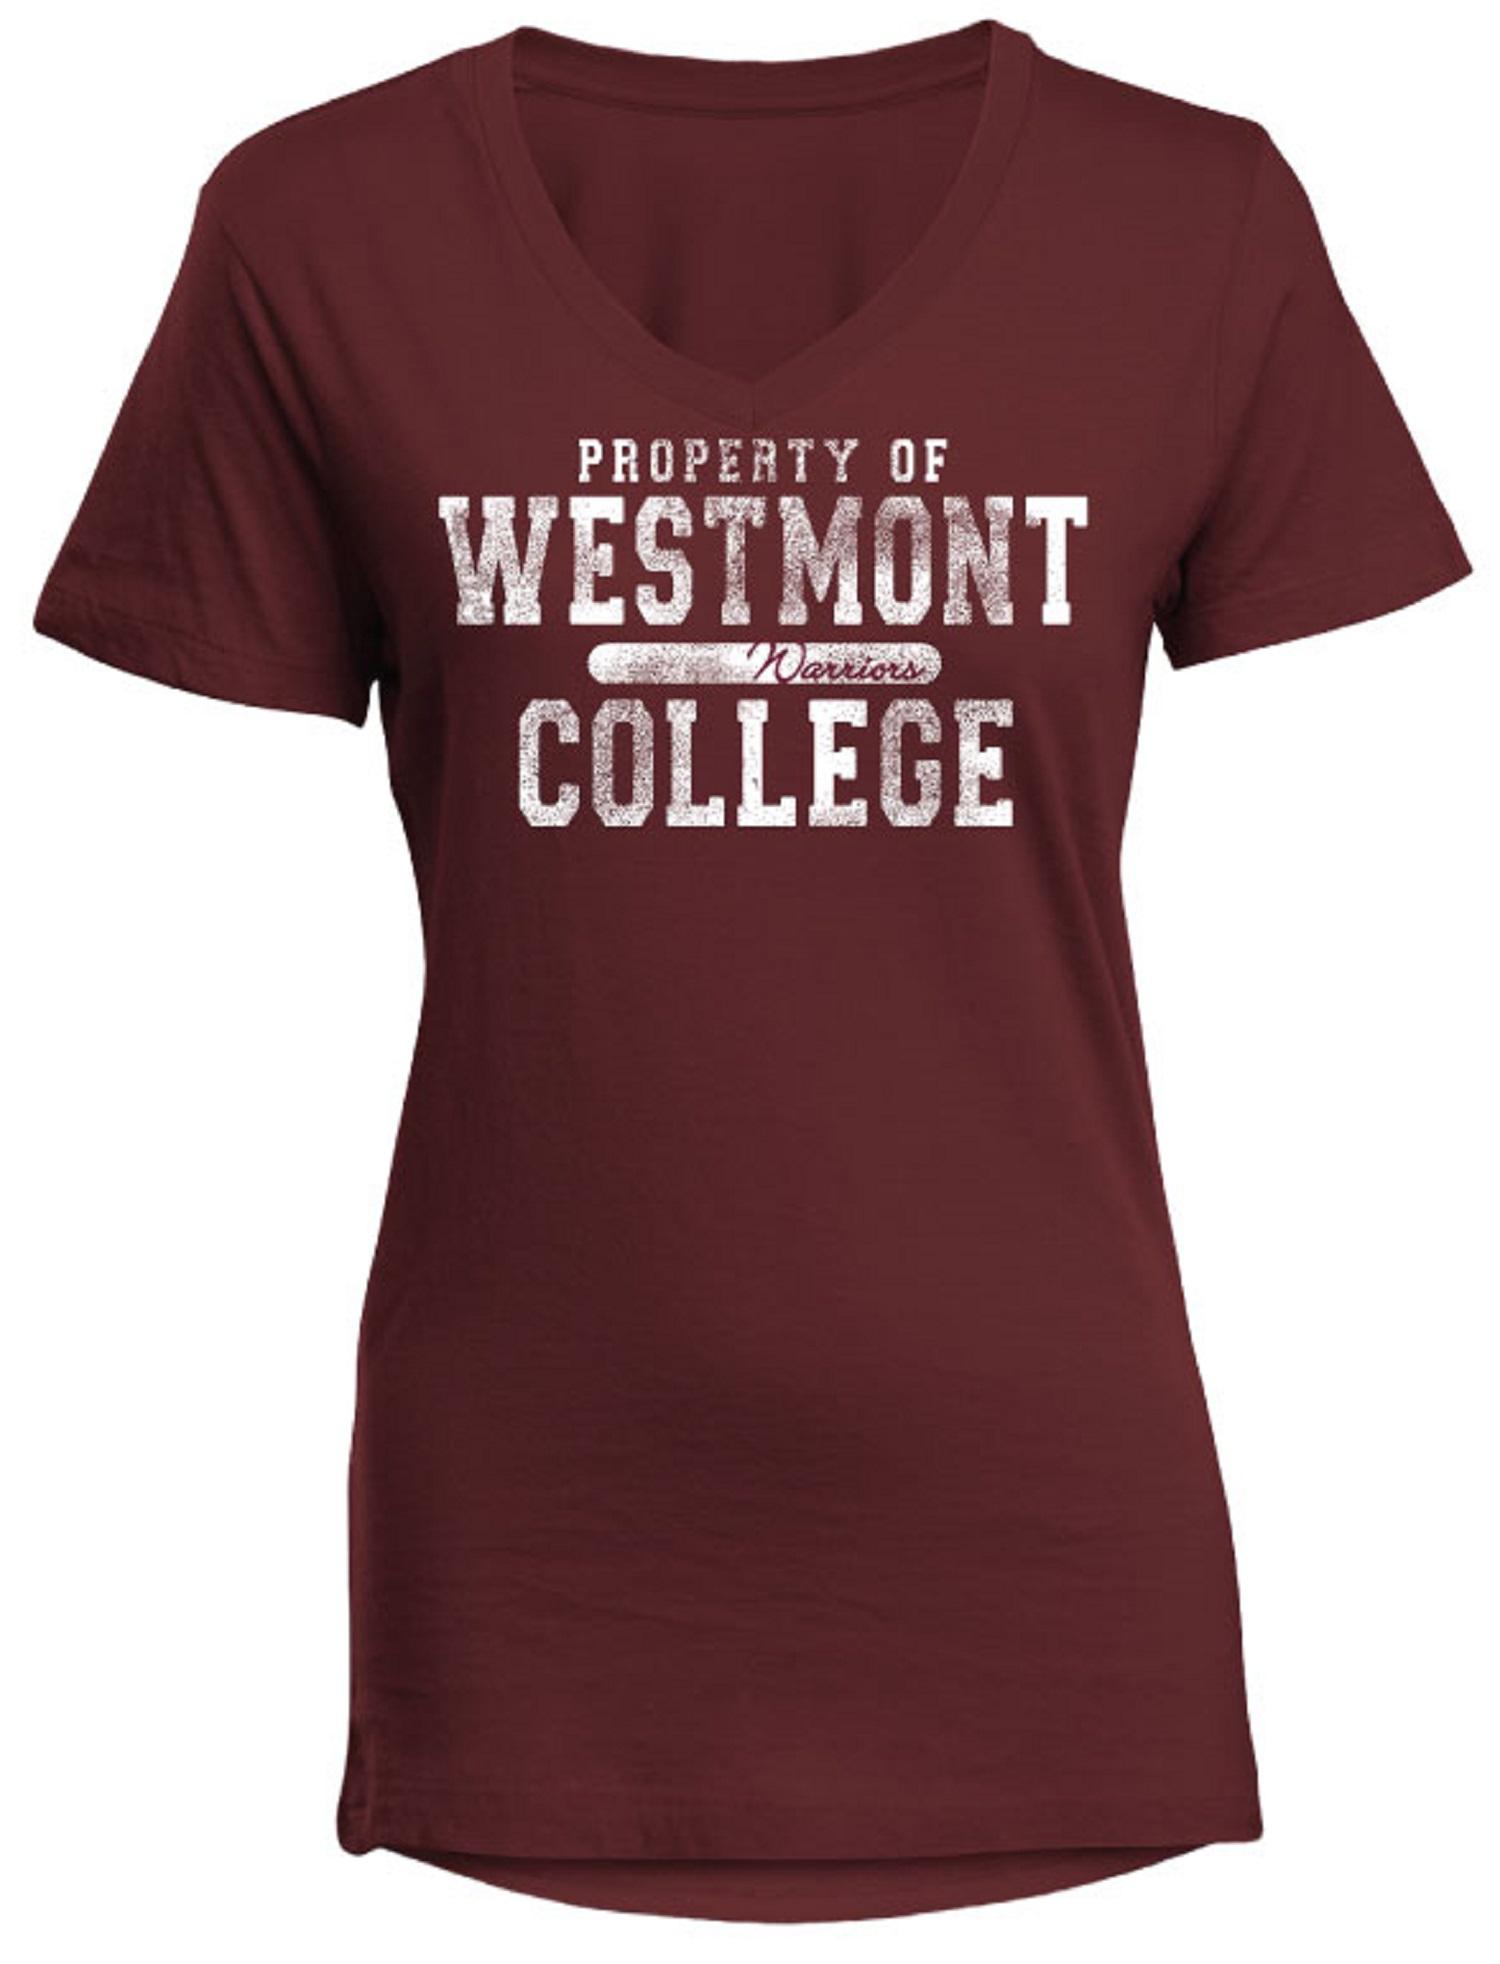 image of: **SALE** Camp David Women's Property of Westmont College V-Neck